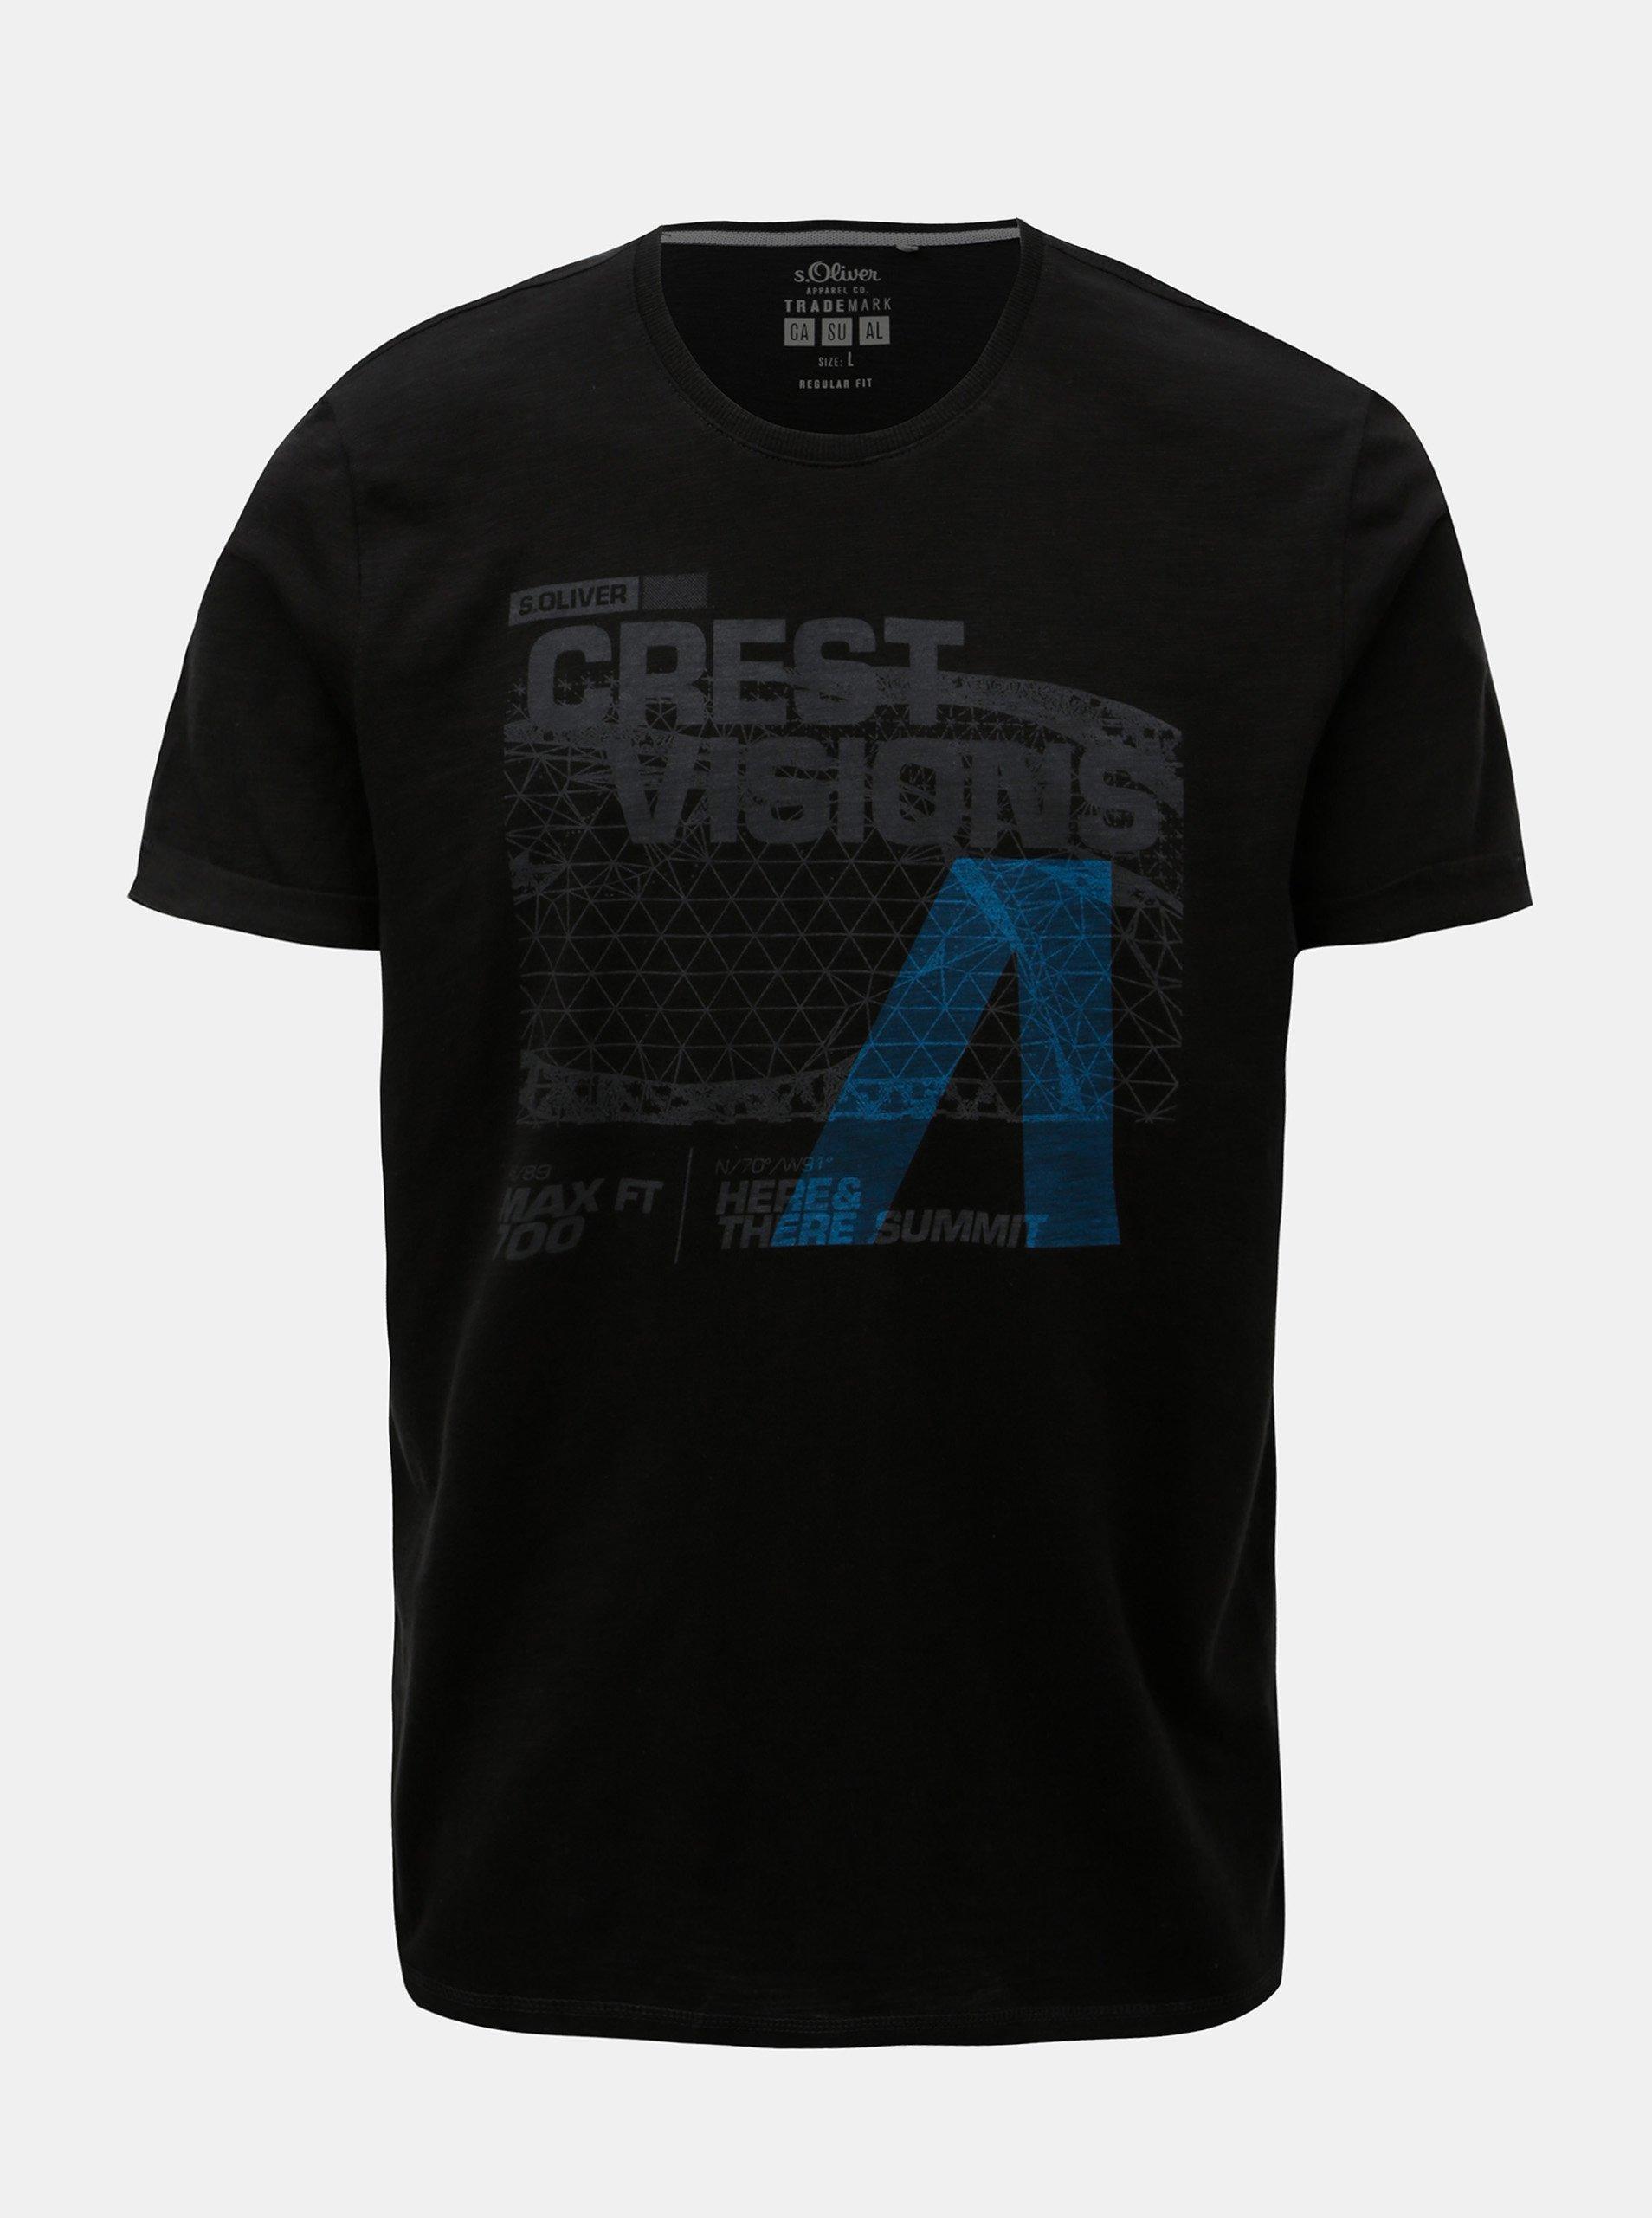 Čierne pánske regular fit tričko s potlačou s.Oliver 7fb40d5b392